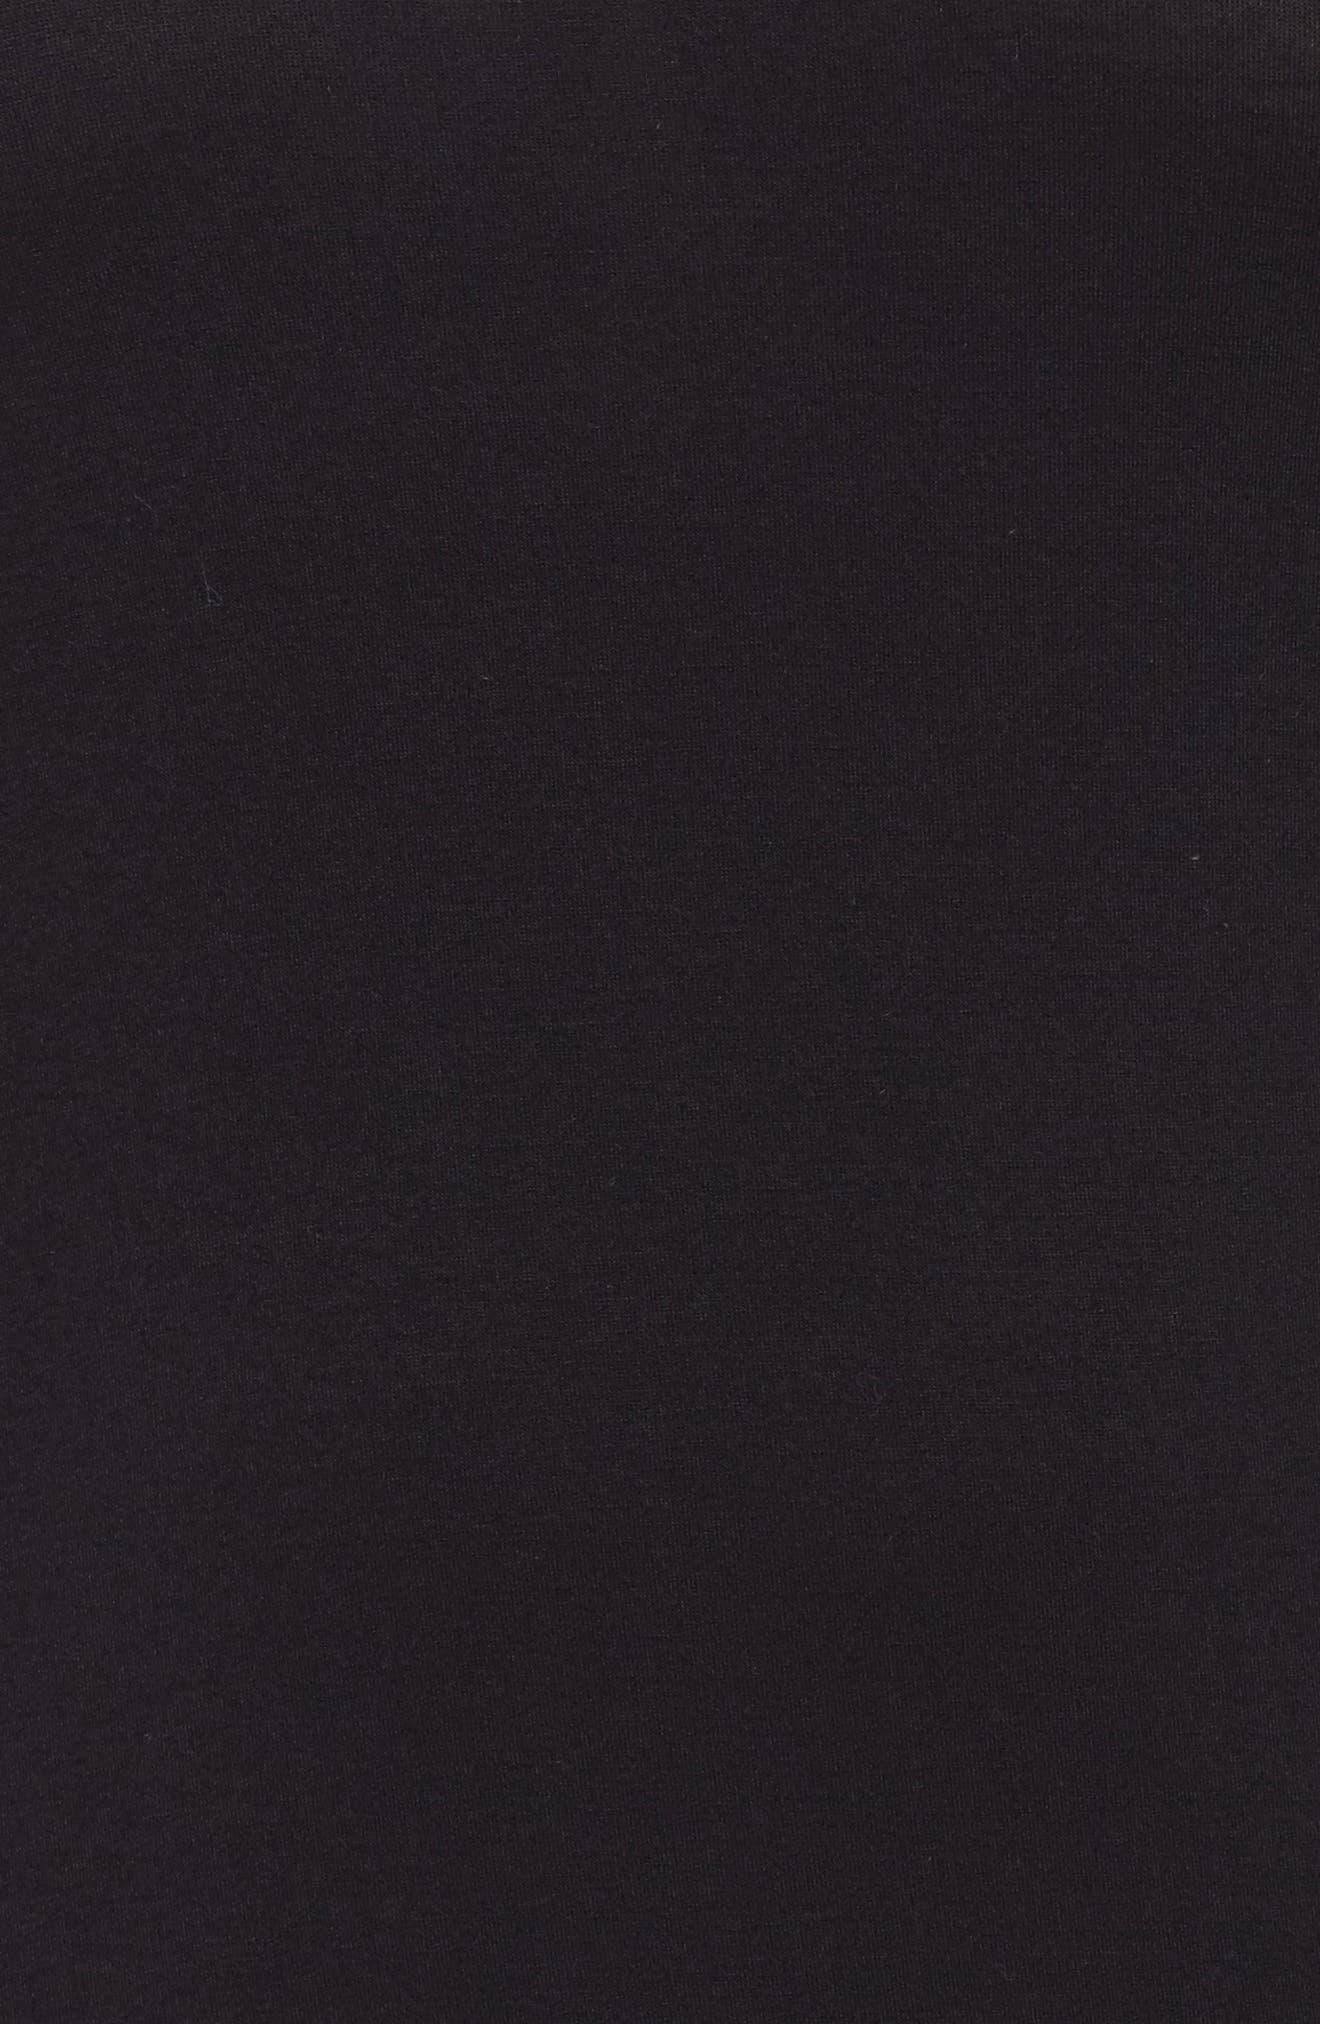 All American Sleep Shirt,                             Alternate thumbnail 5, color,                             BLACK